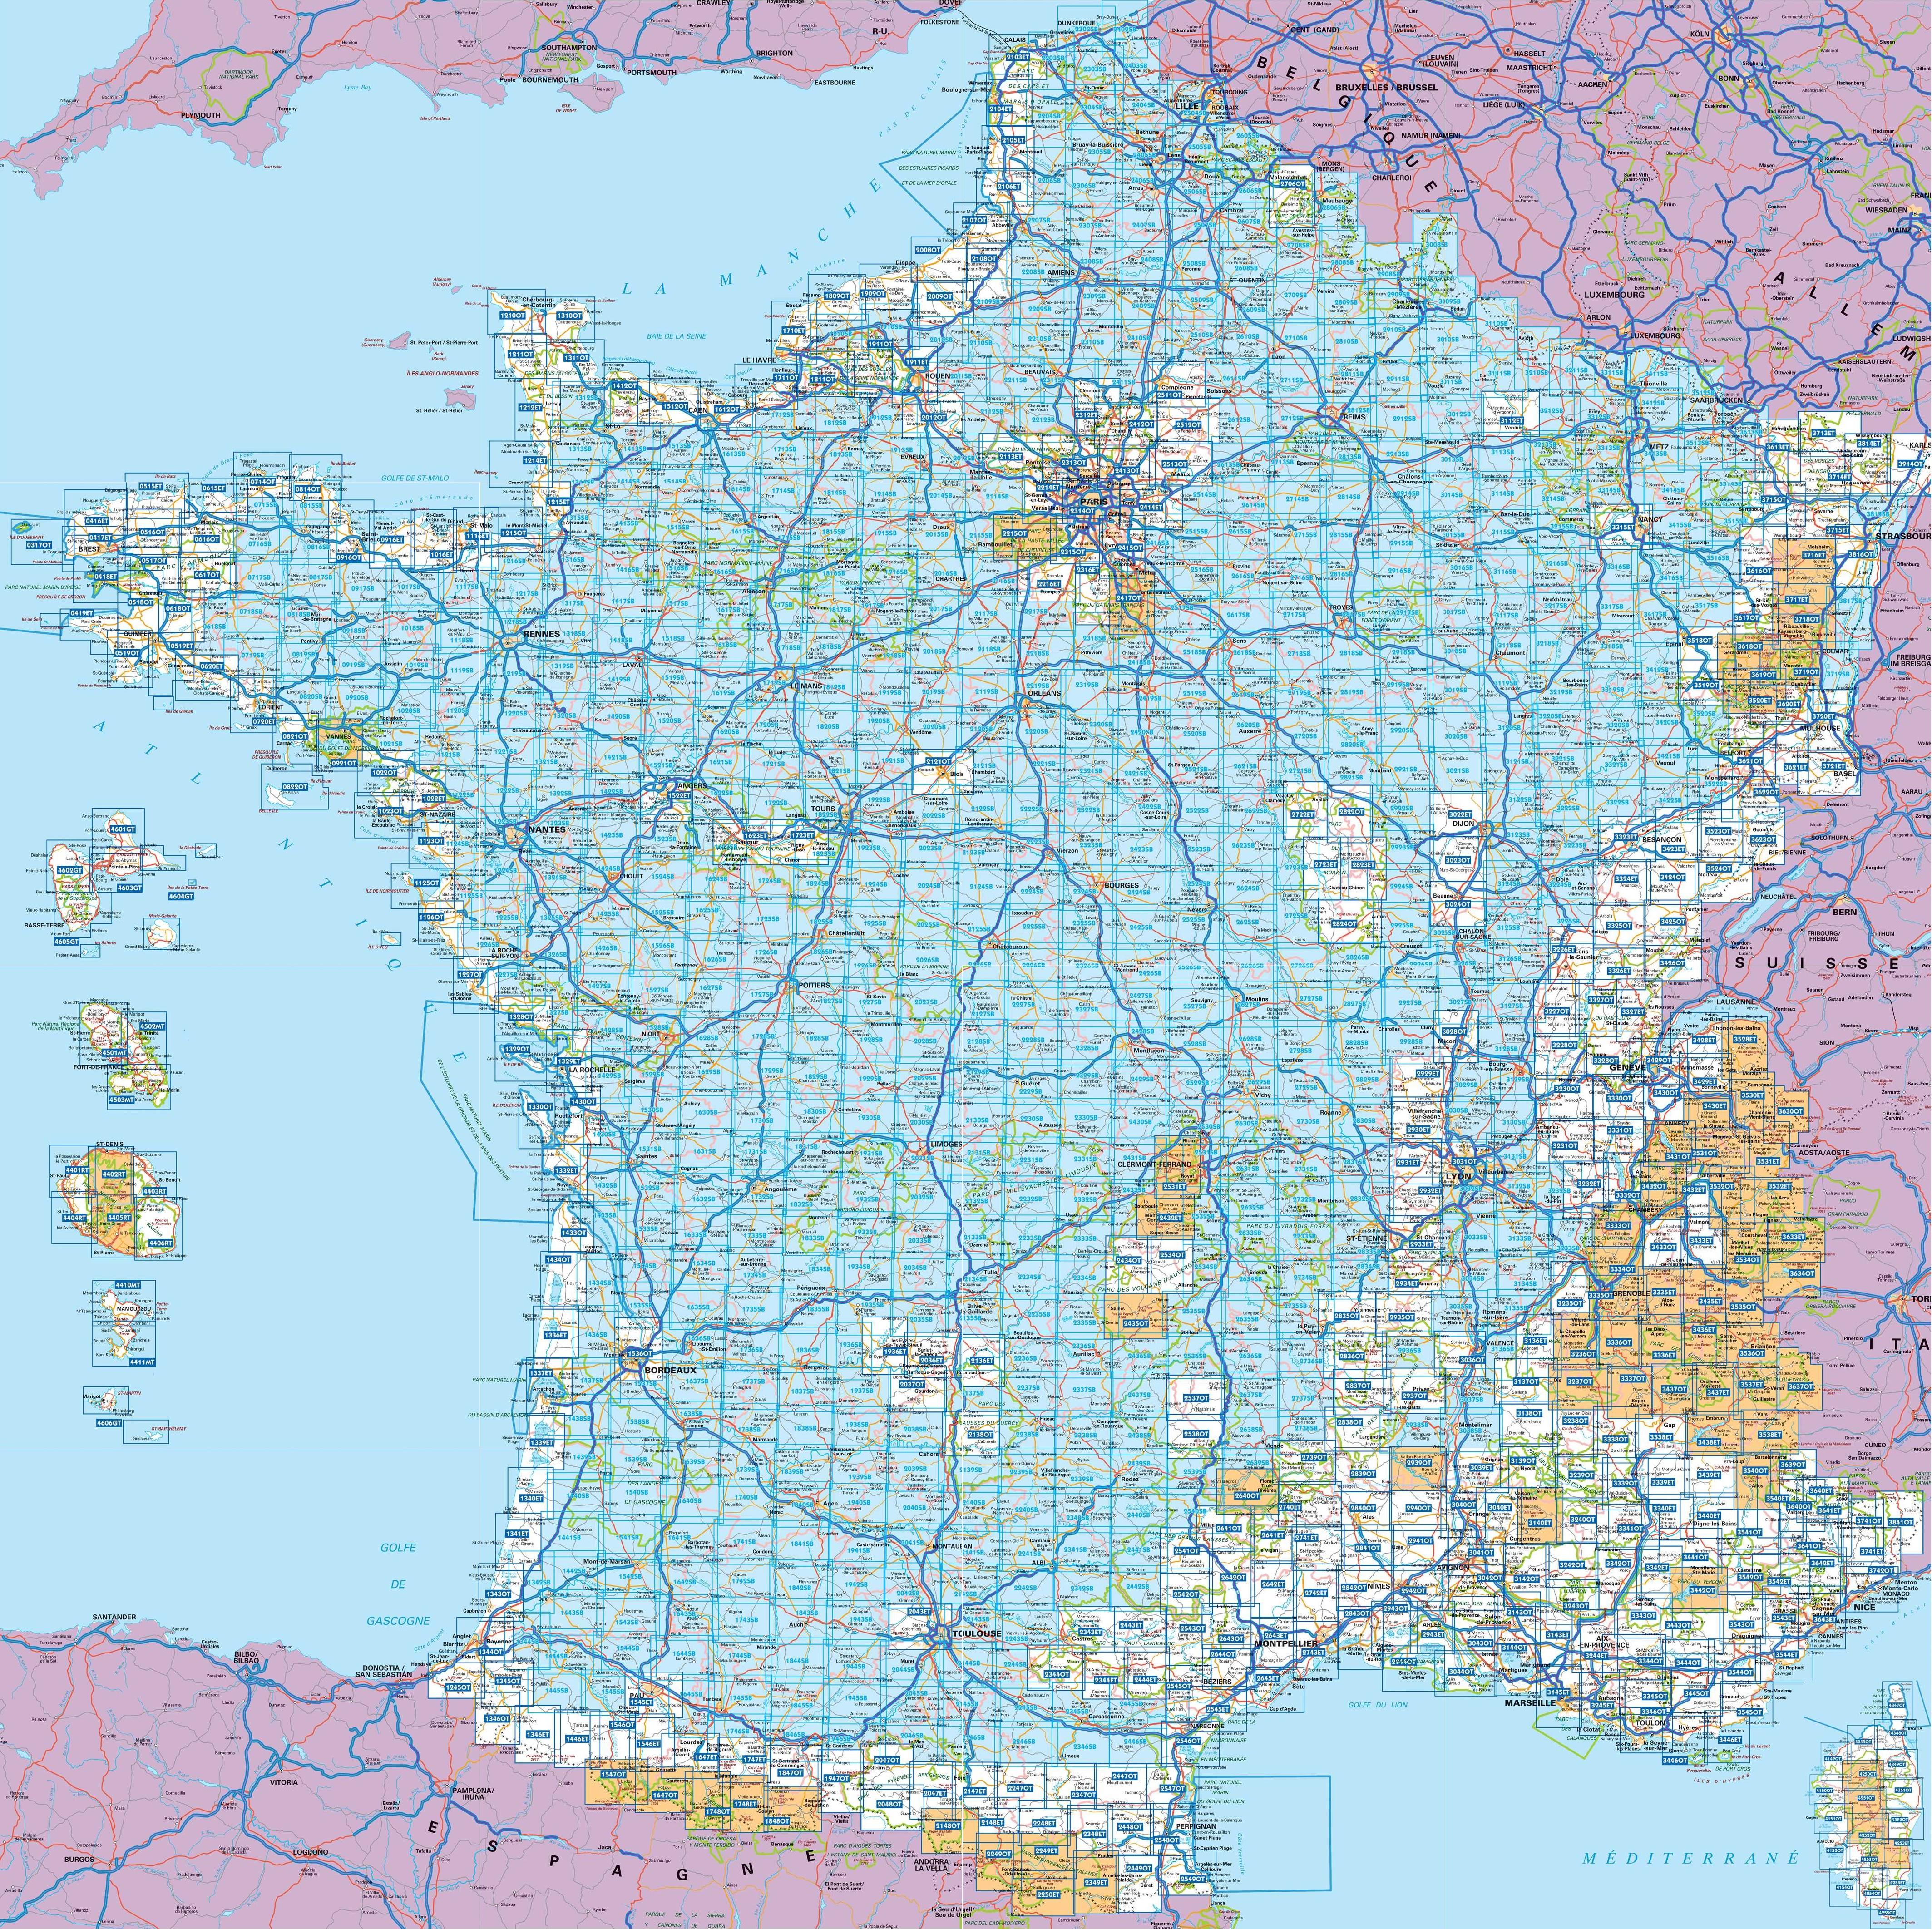 Elsass Karte Frankreich.Ign 3718 Ot Colmar Kayserberg Frankreich Topographische Wanderkarte 1 25 000